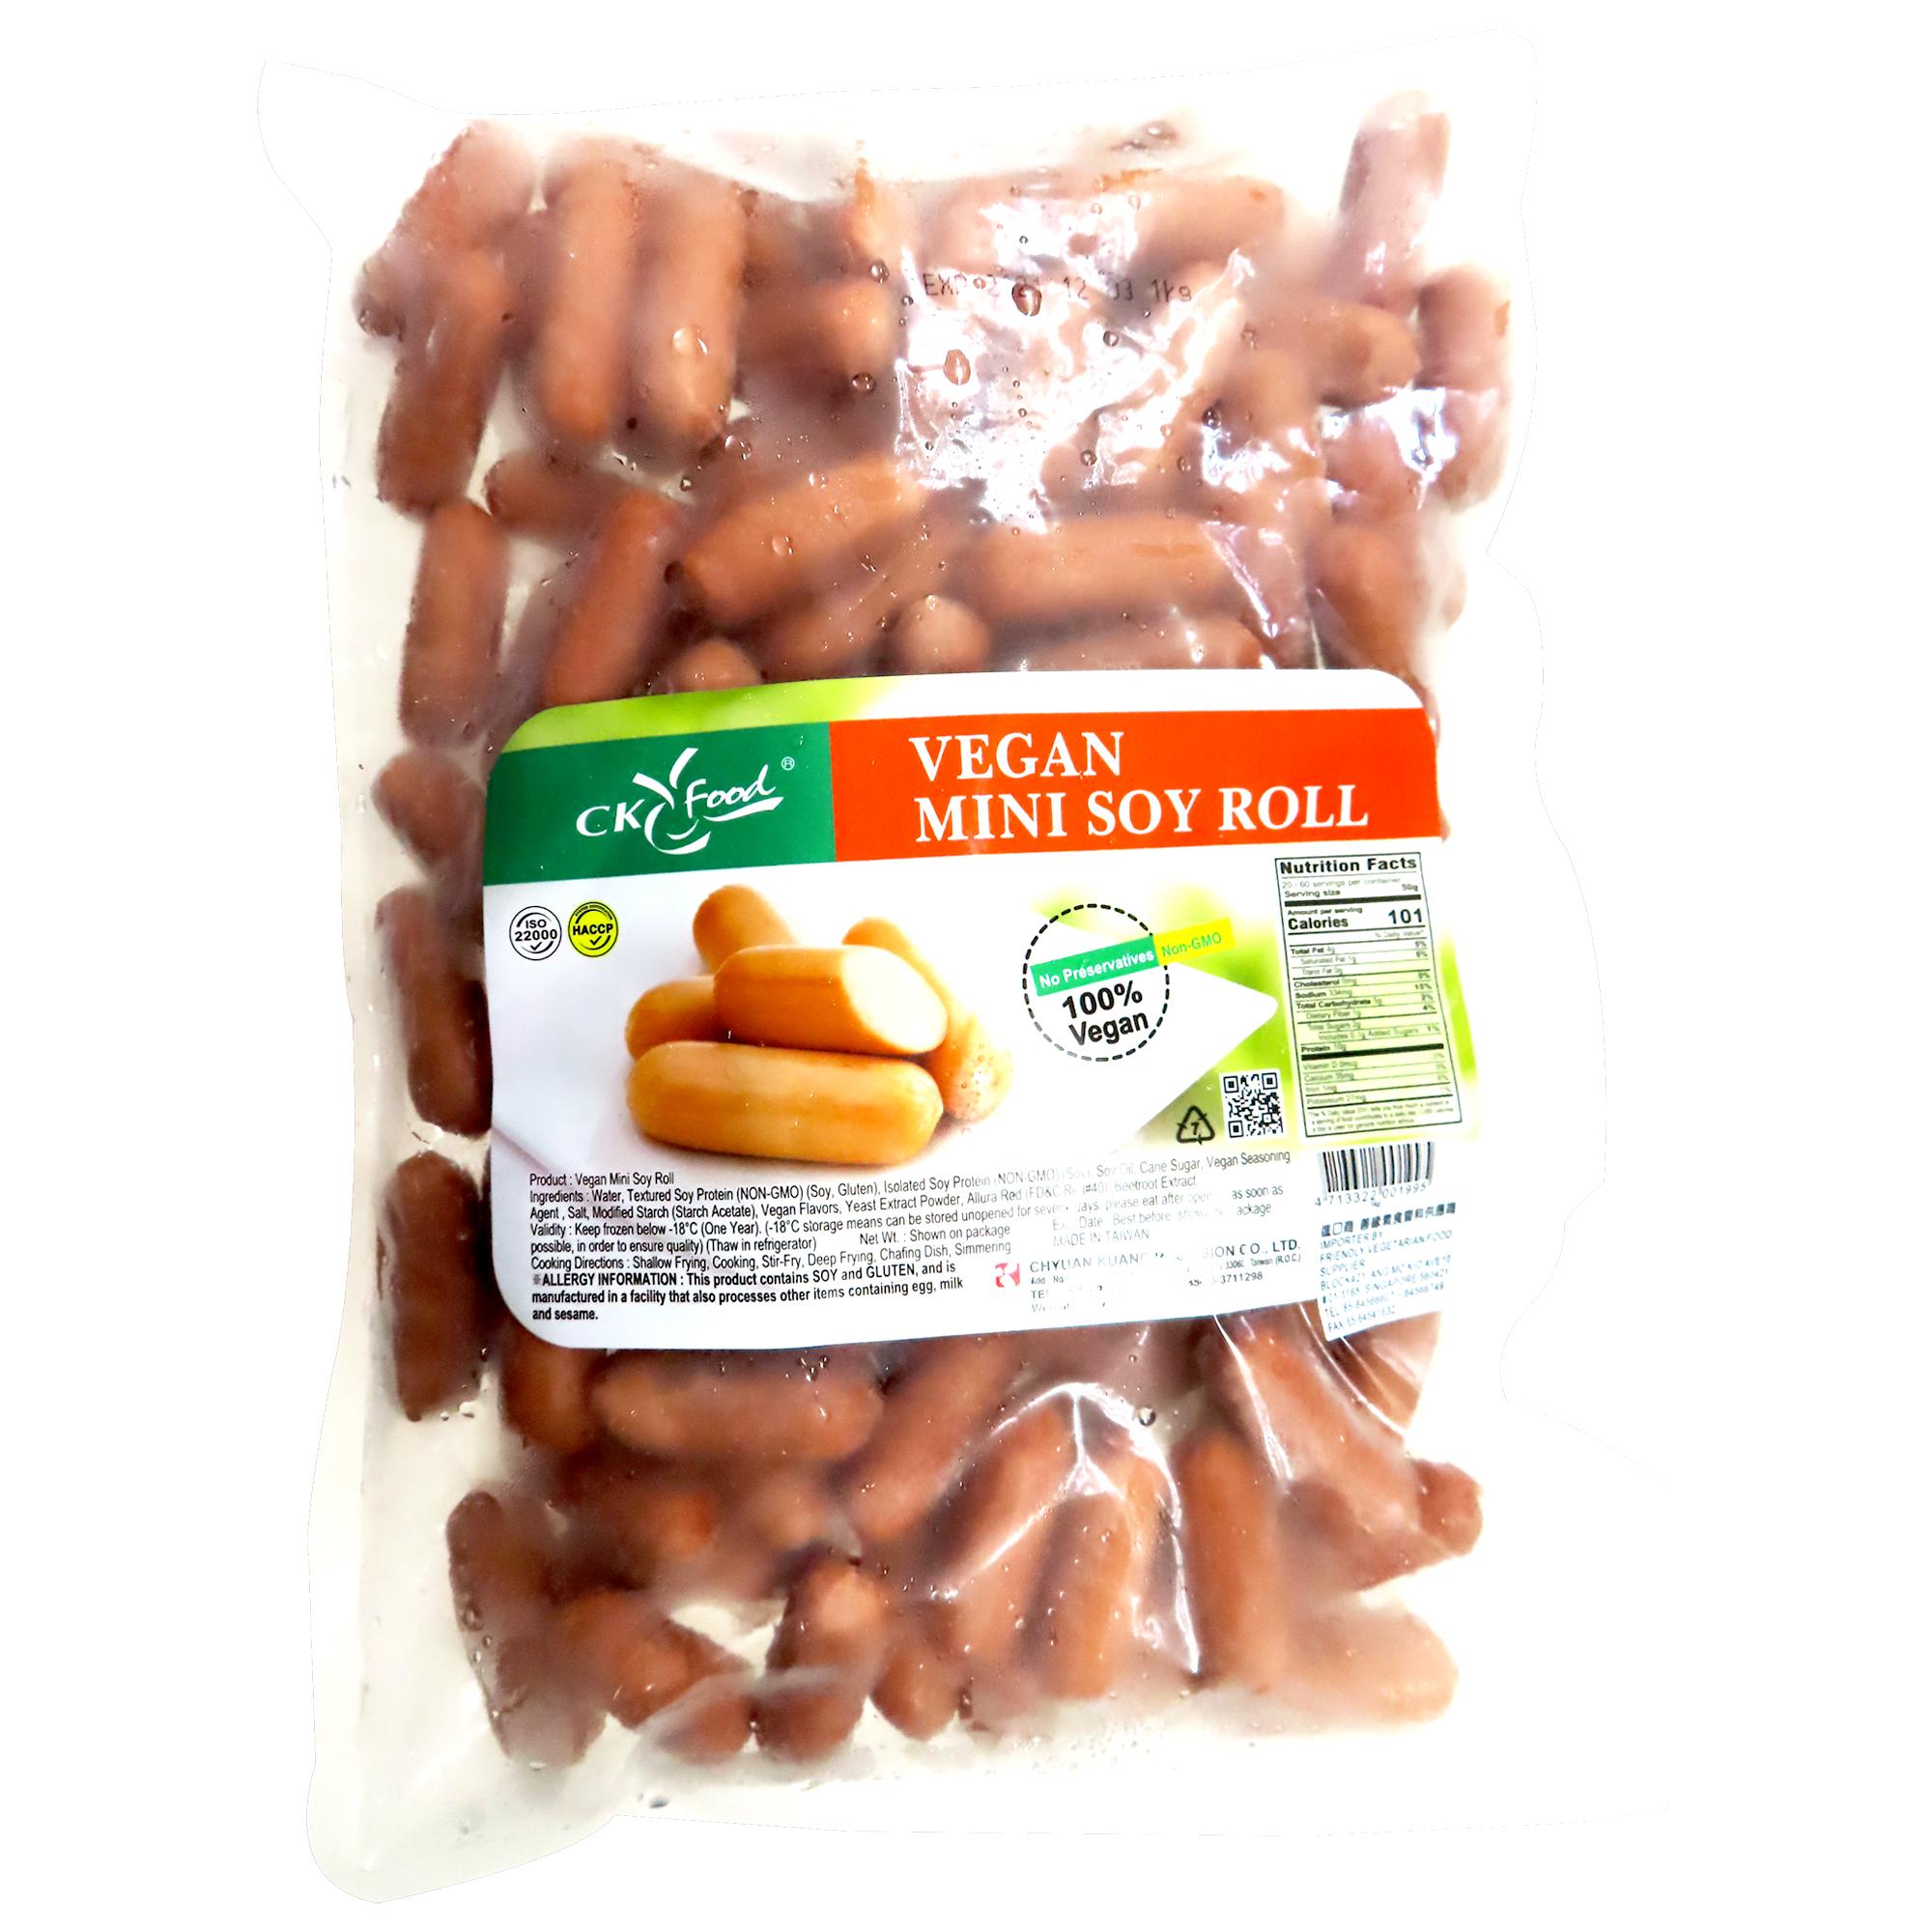 Image Vegan Mini Soy Roll 全广 - 全素QQ肠 1000grams